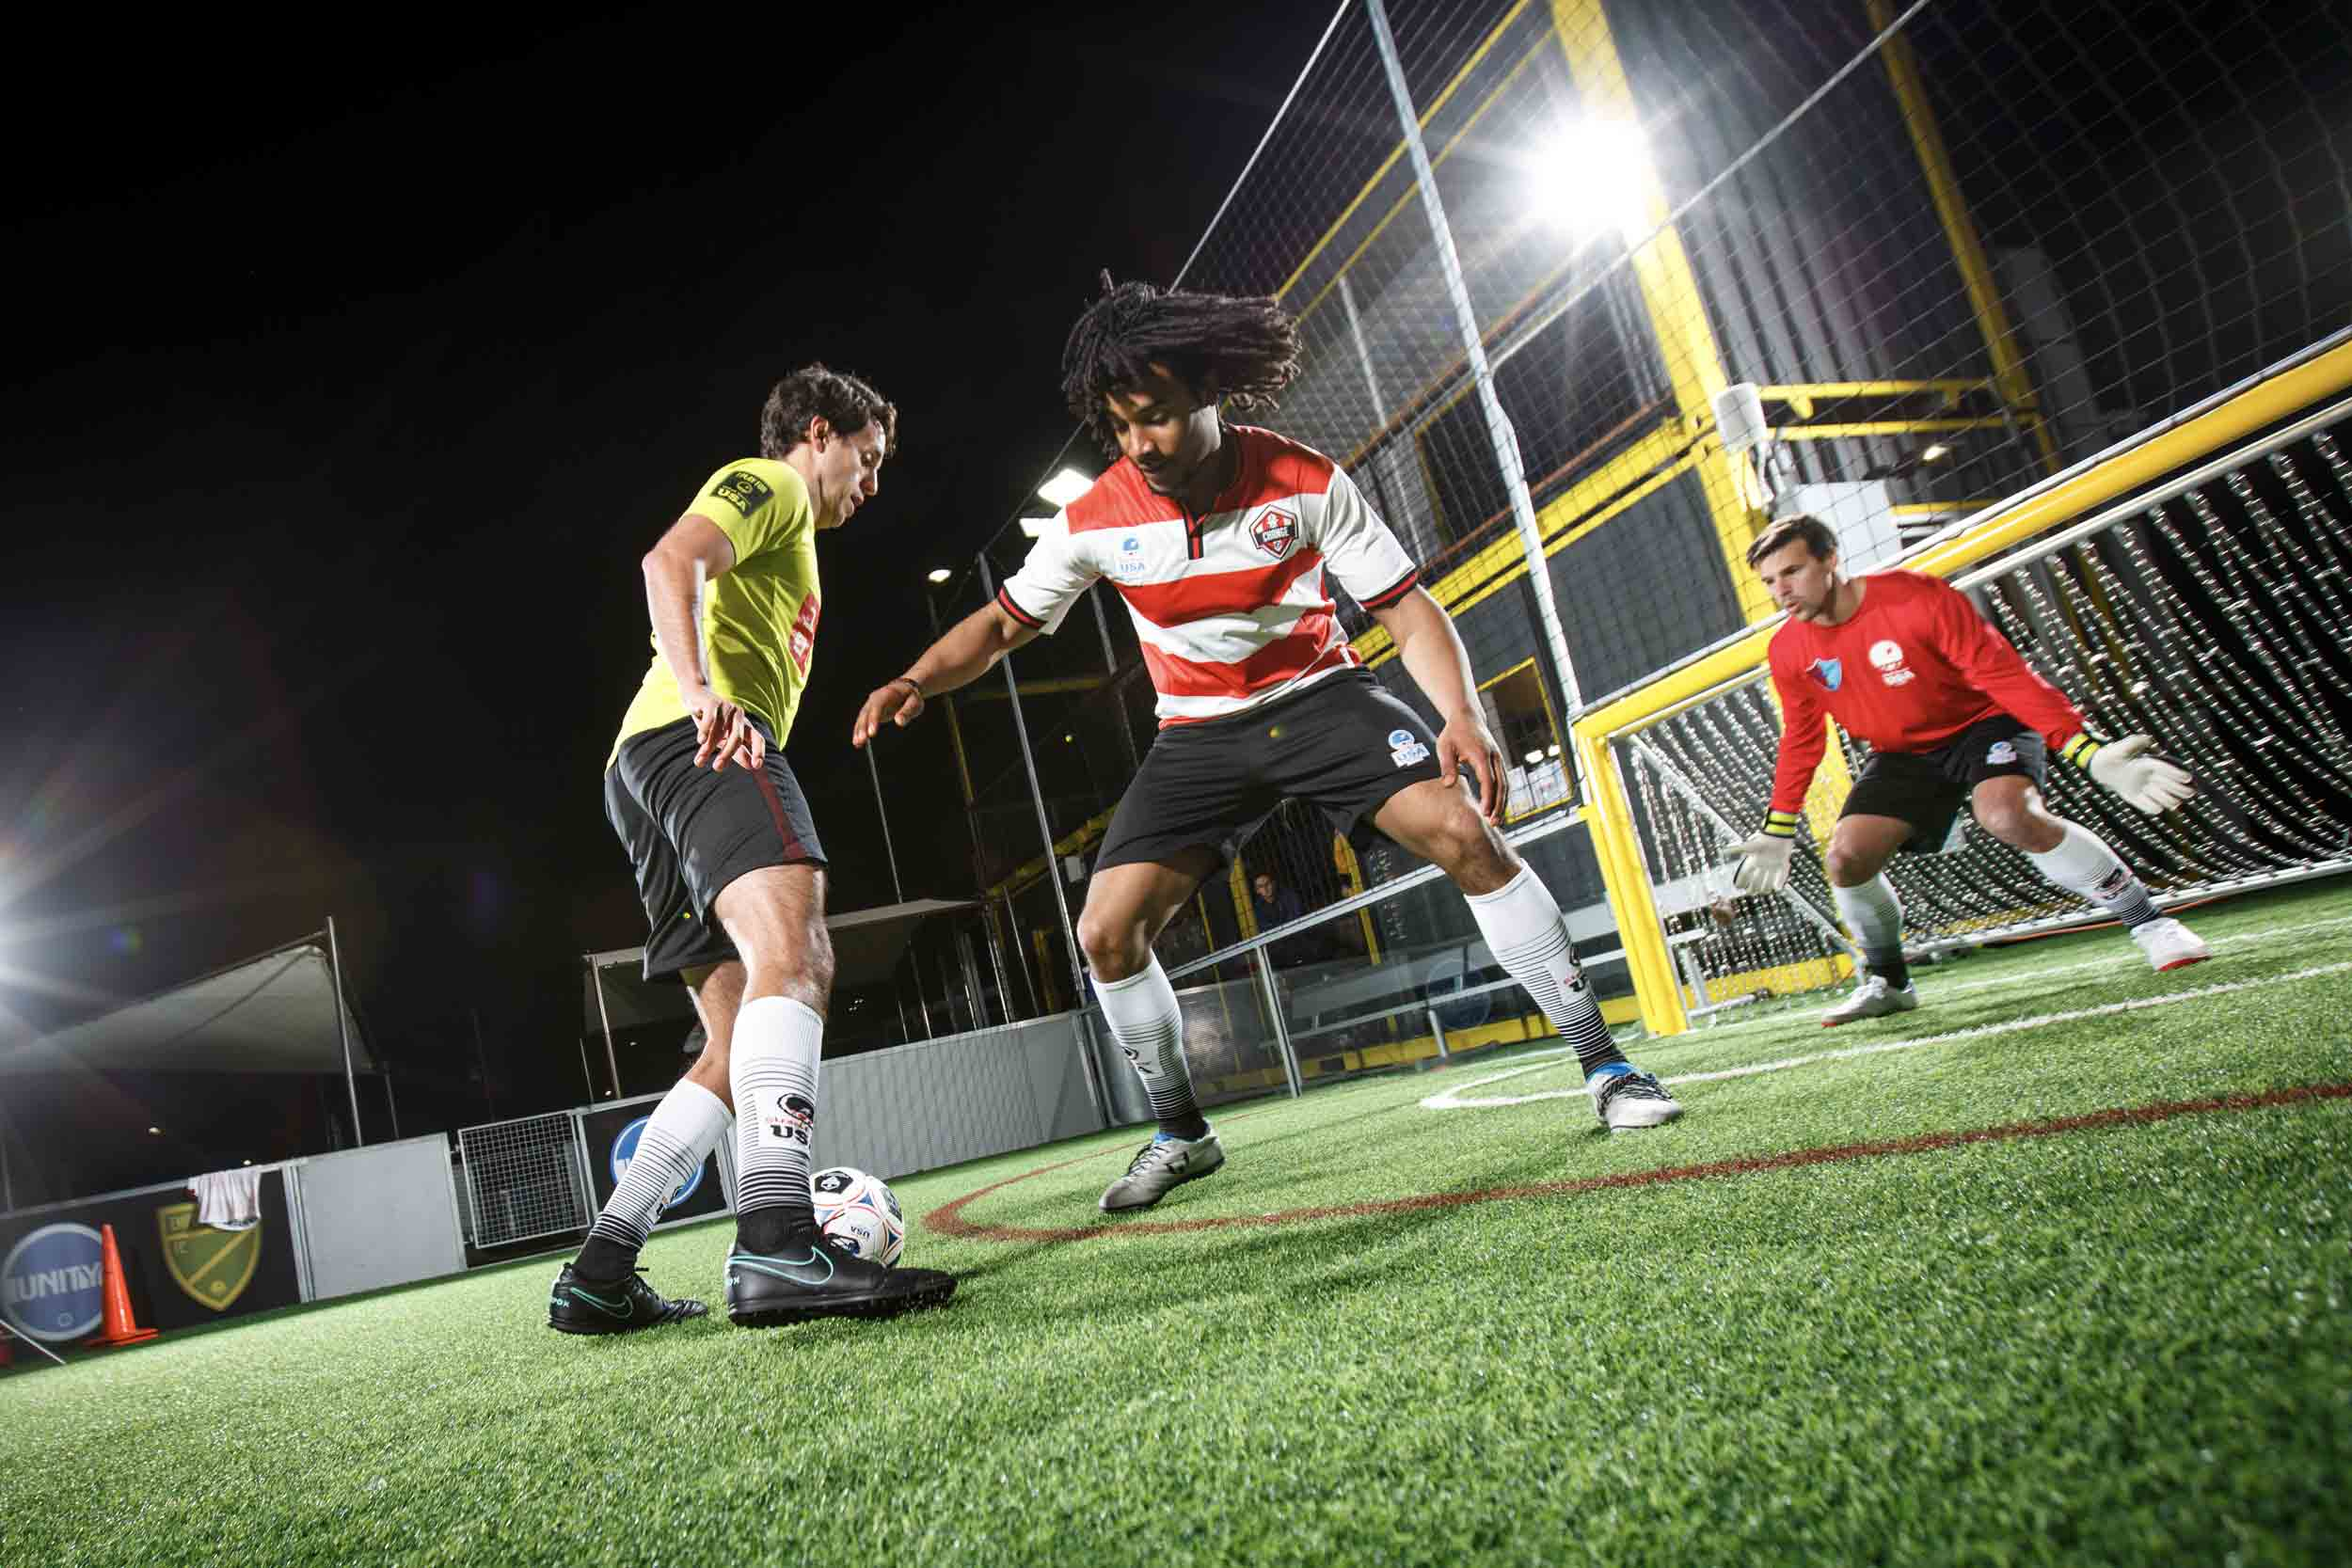 Three men playing small-sided soccer at Urban Soccer Park in San Francisco at night.